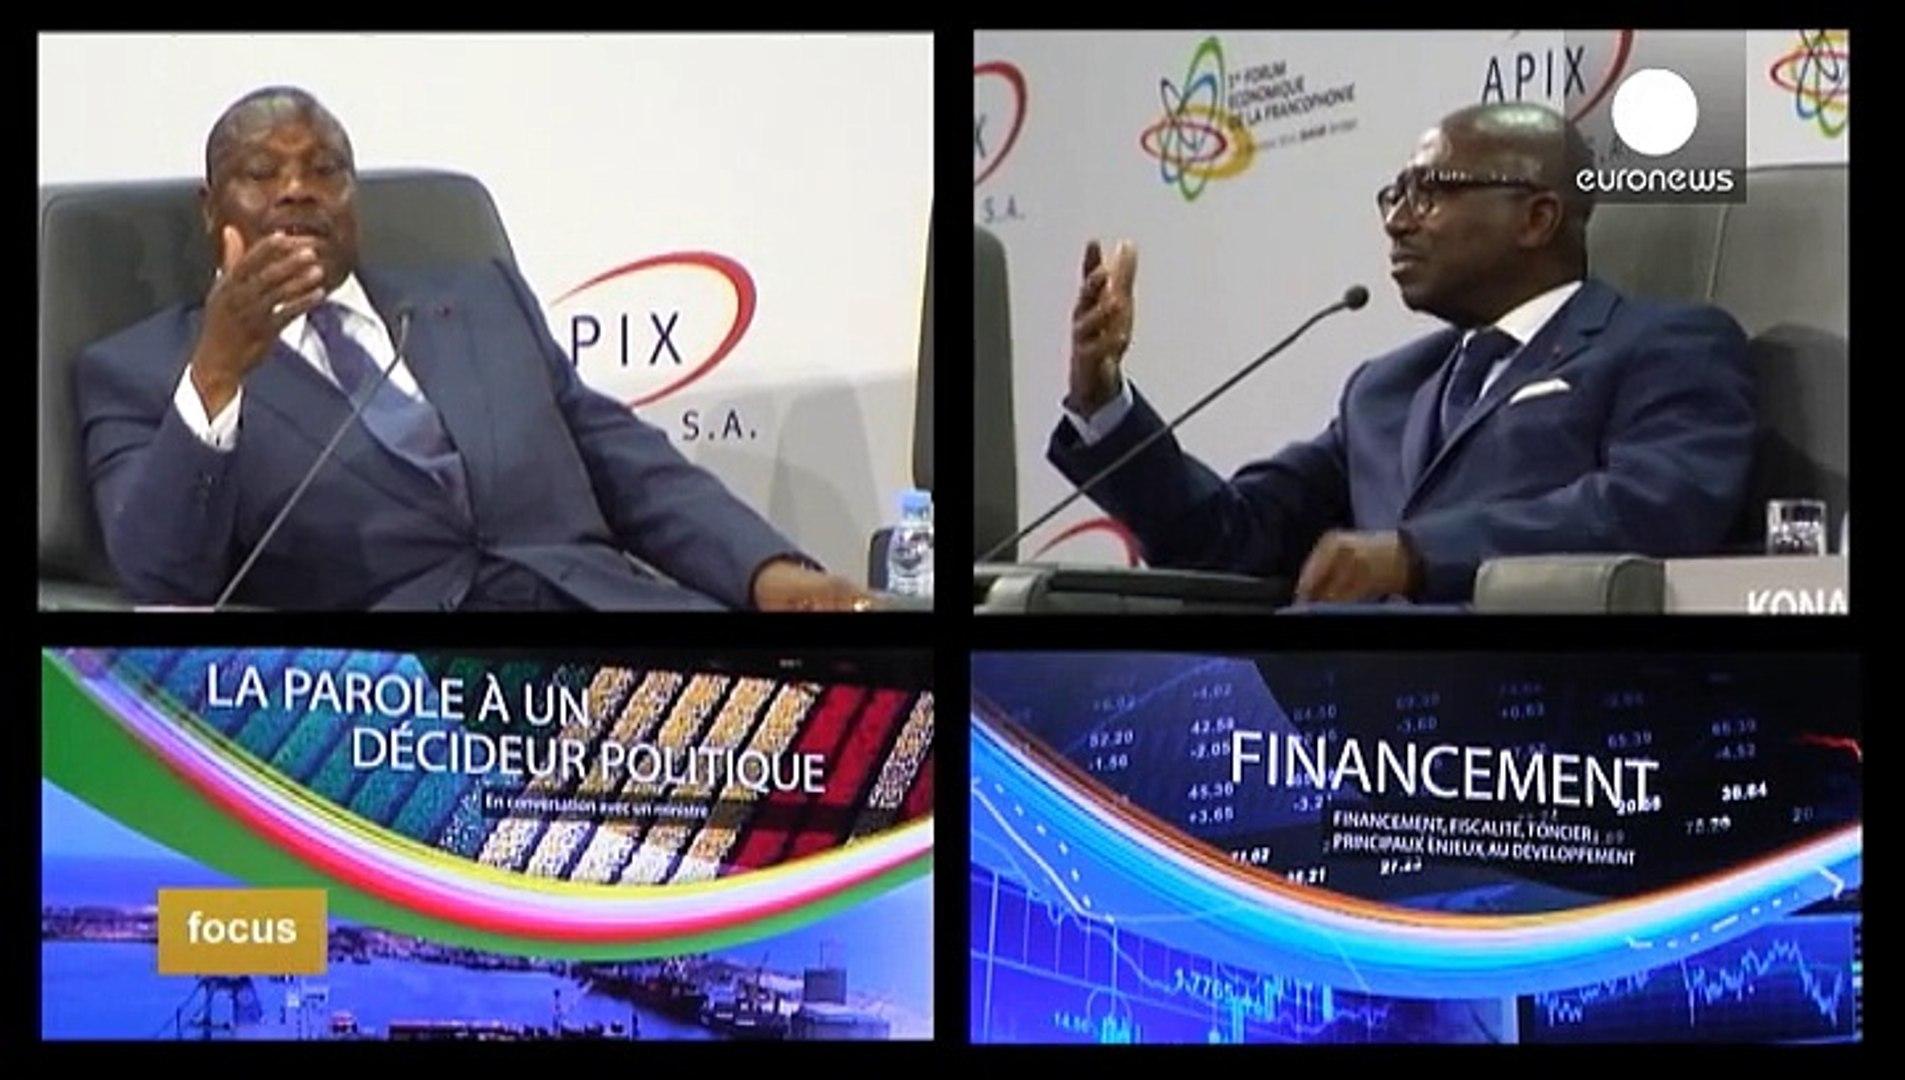 Франкоязычная молодежь Африки -- богатство континента